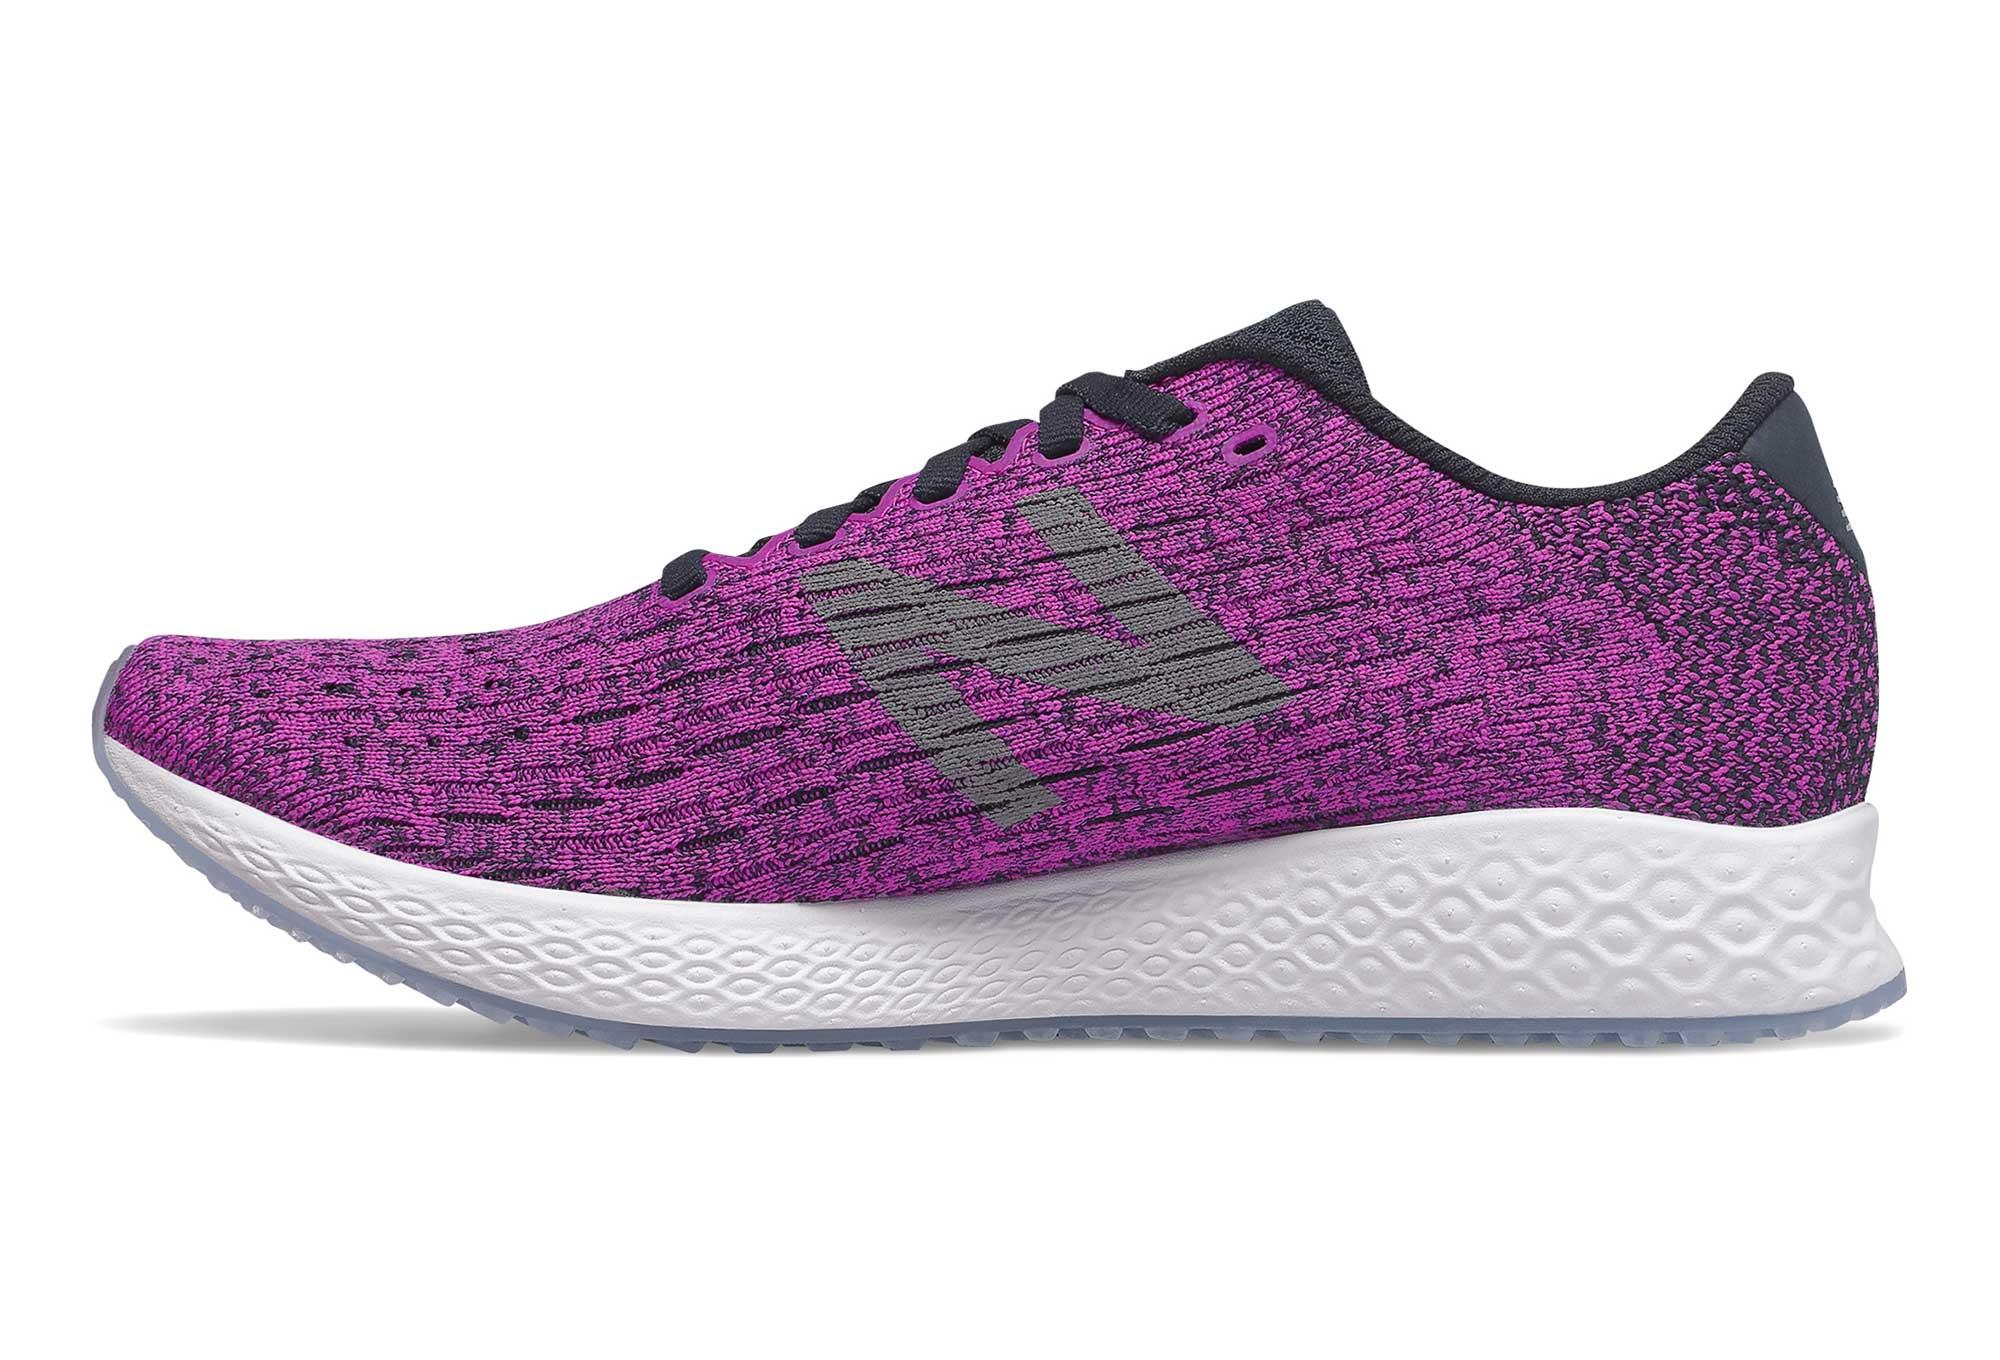 New Balance Fresh Foam Zante Pursuit Violeta Mujer